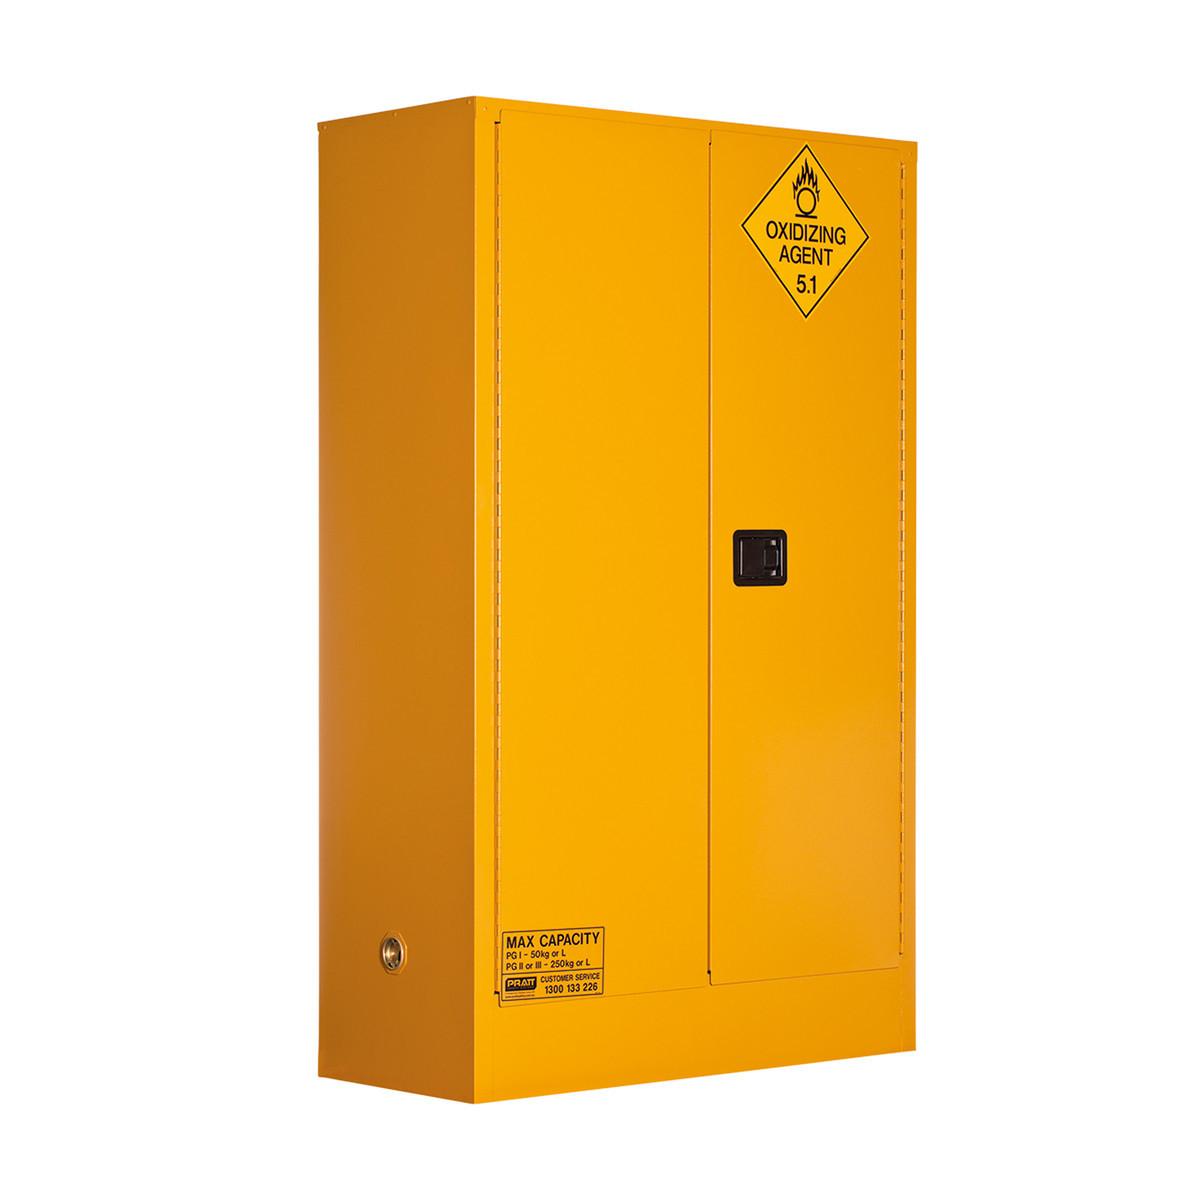 Oxidizing Agent Storage Cabinet 250 Liters - 2 Door, 3 Shelf